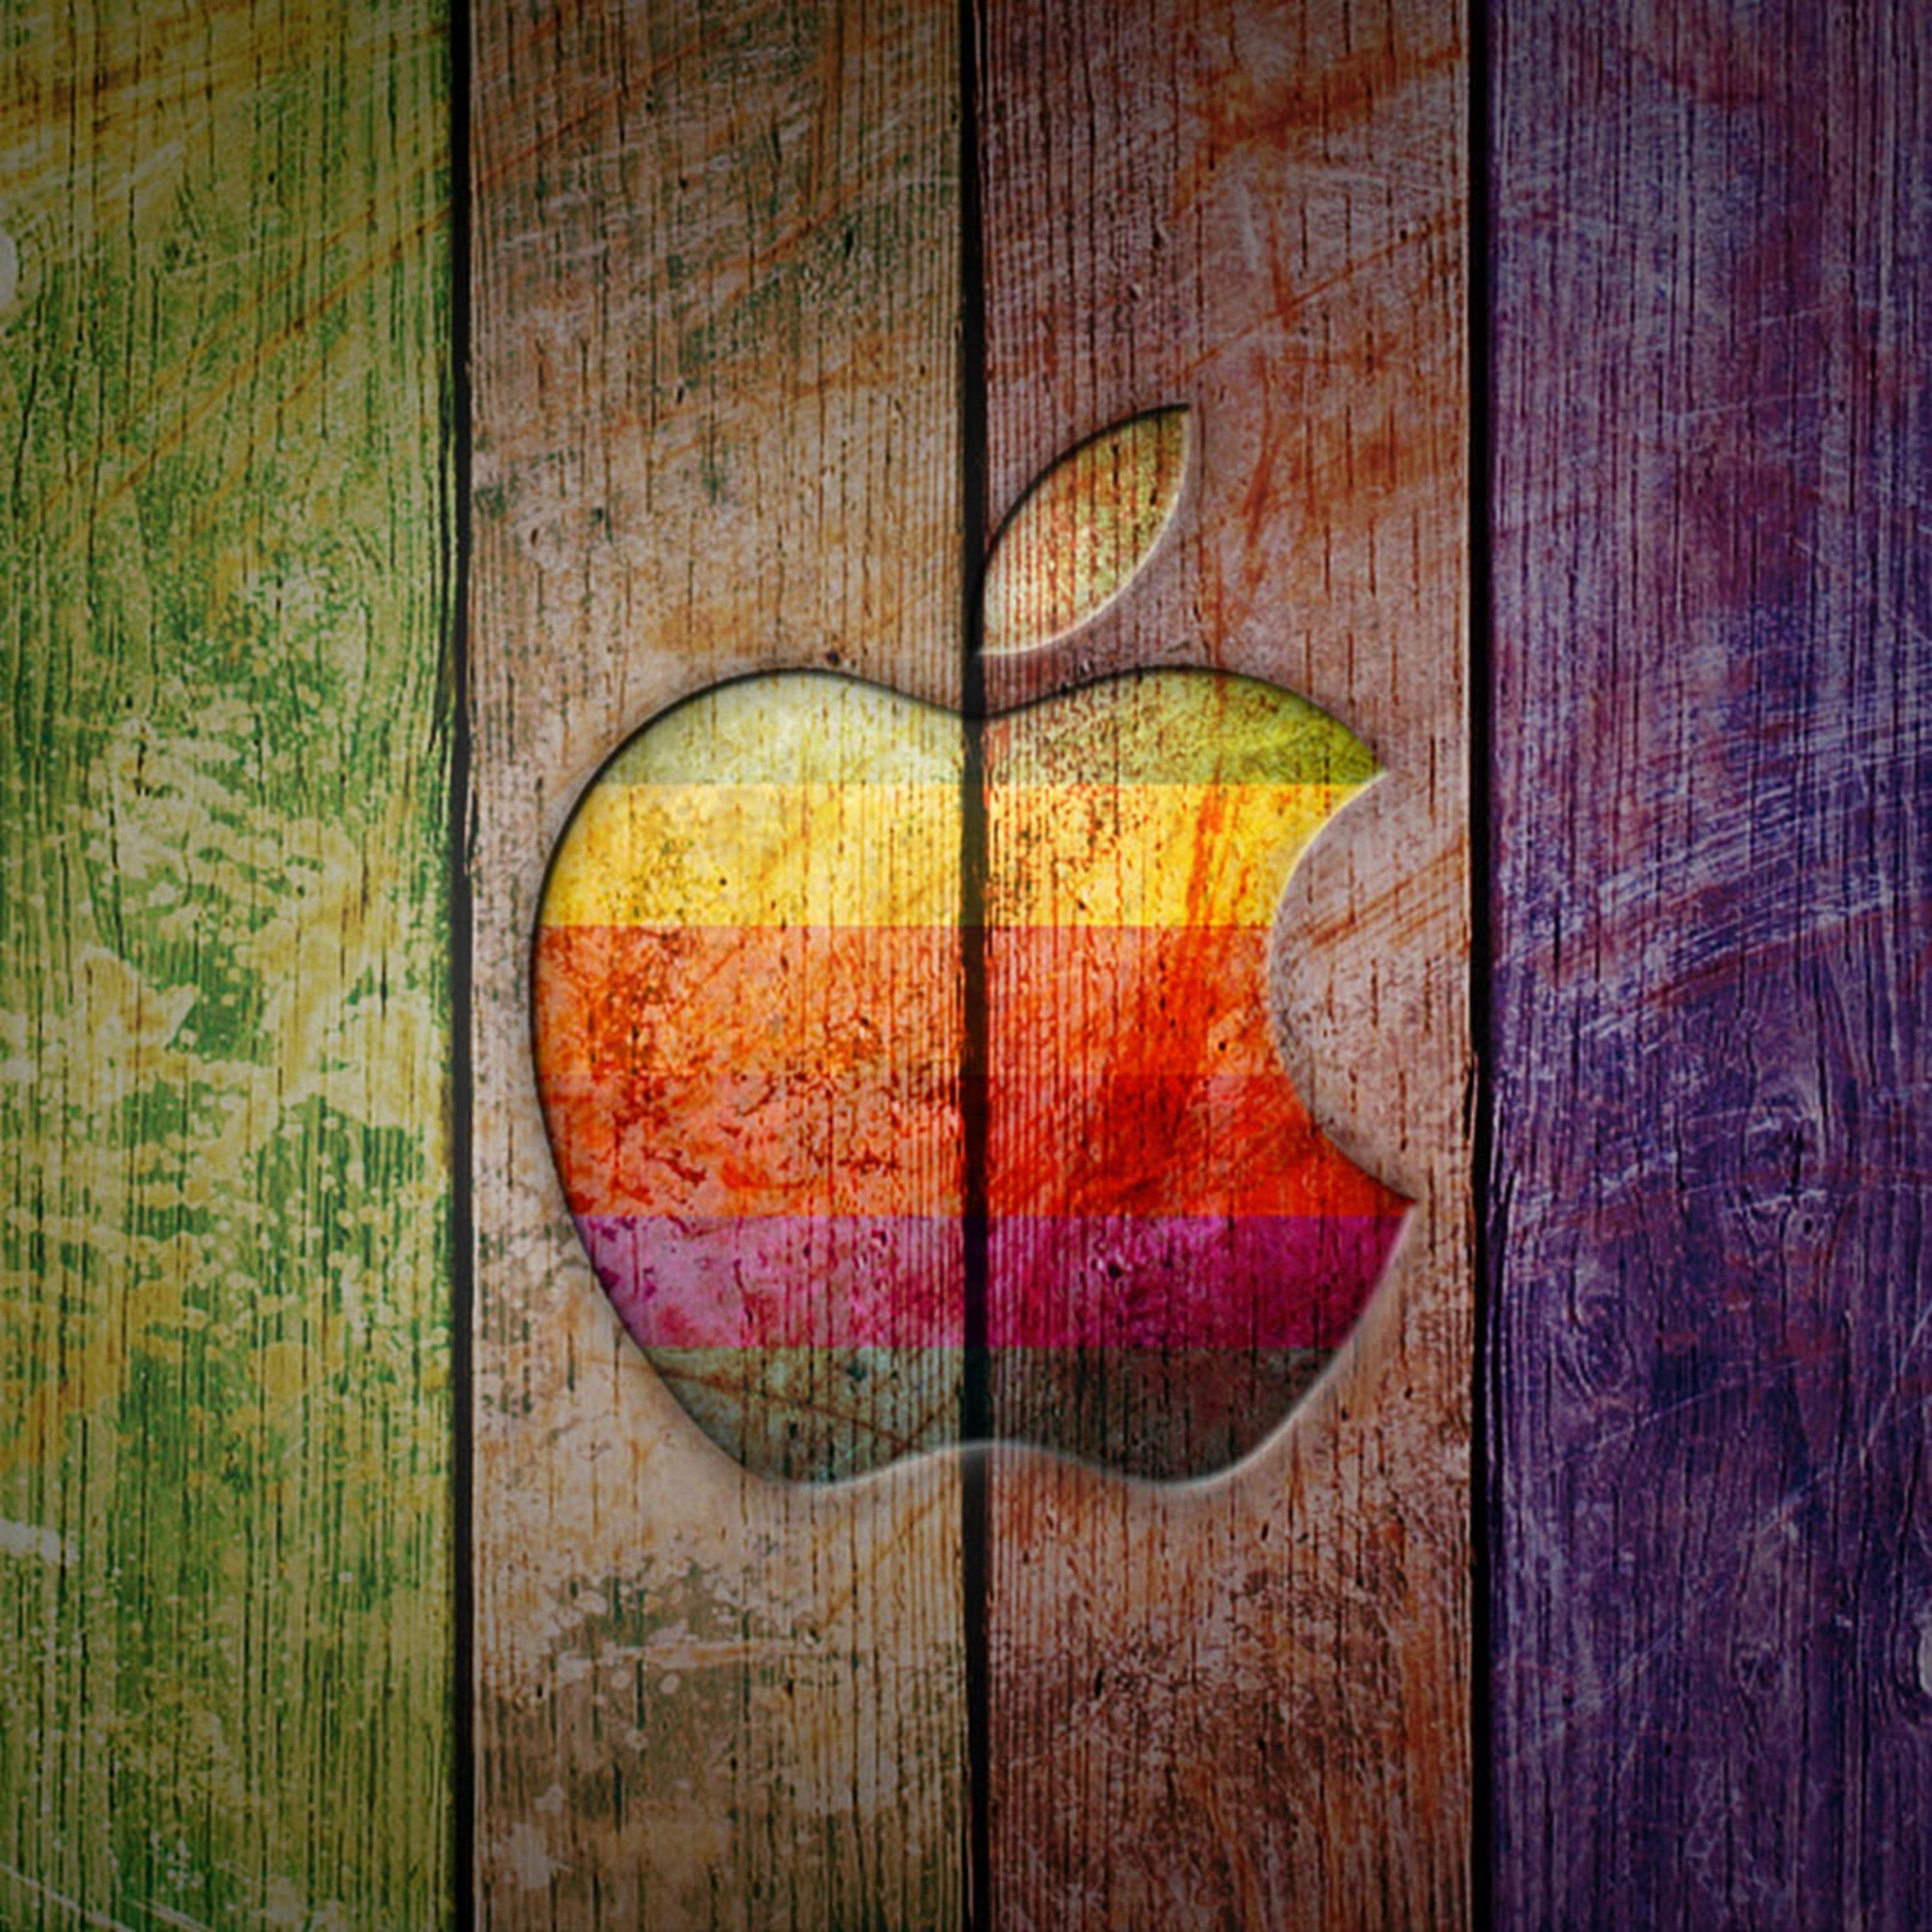 2780x2780 Parallax wallpaper 4k Apple Logo on Colorful Wood Ipad Wallpaper 2780x2780 pixels resolution